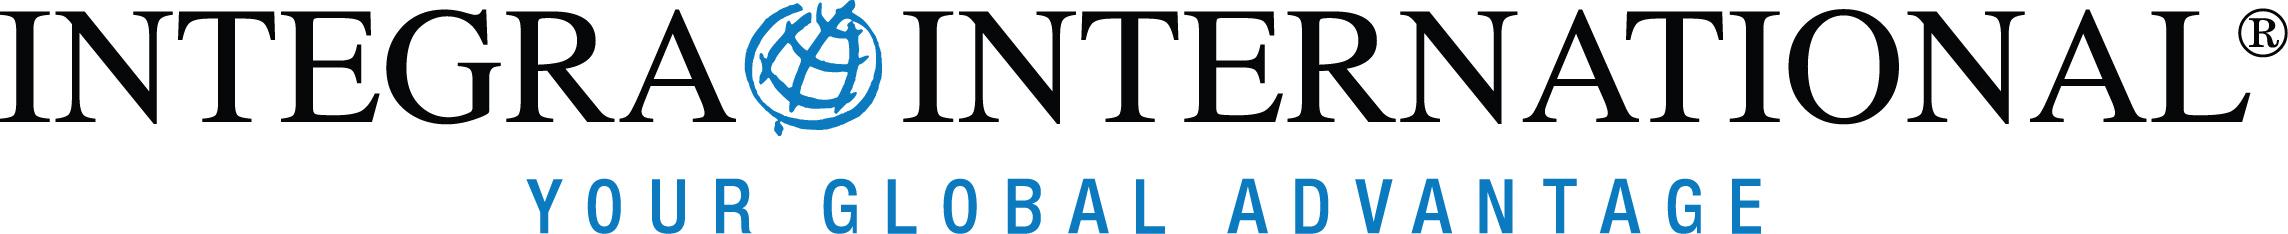 IntegraInternational_Logo_2017